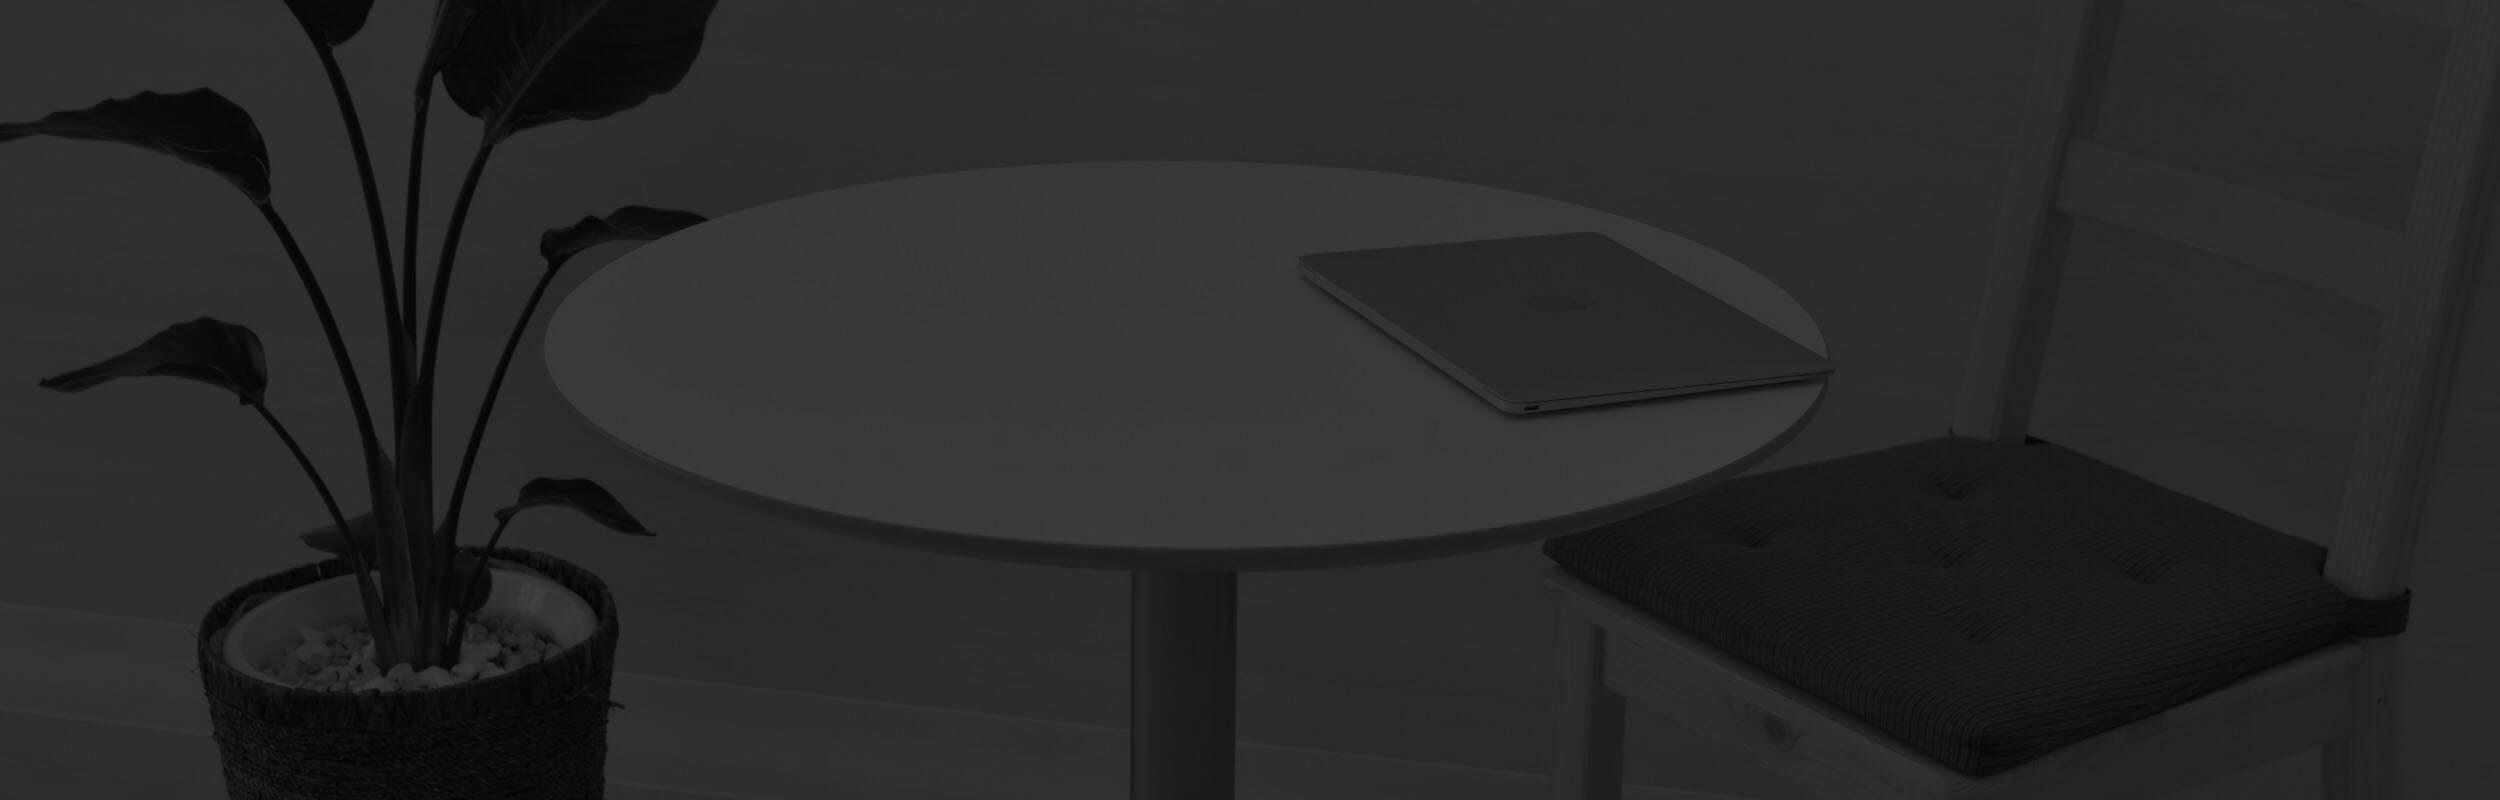 stôl, stolička, rastlina